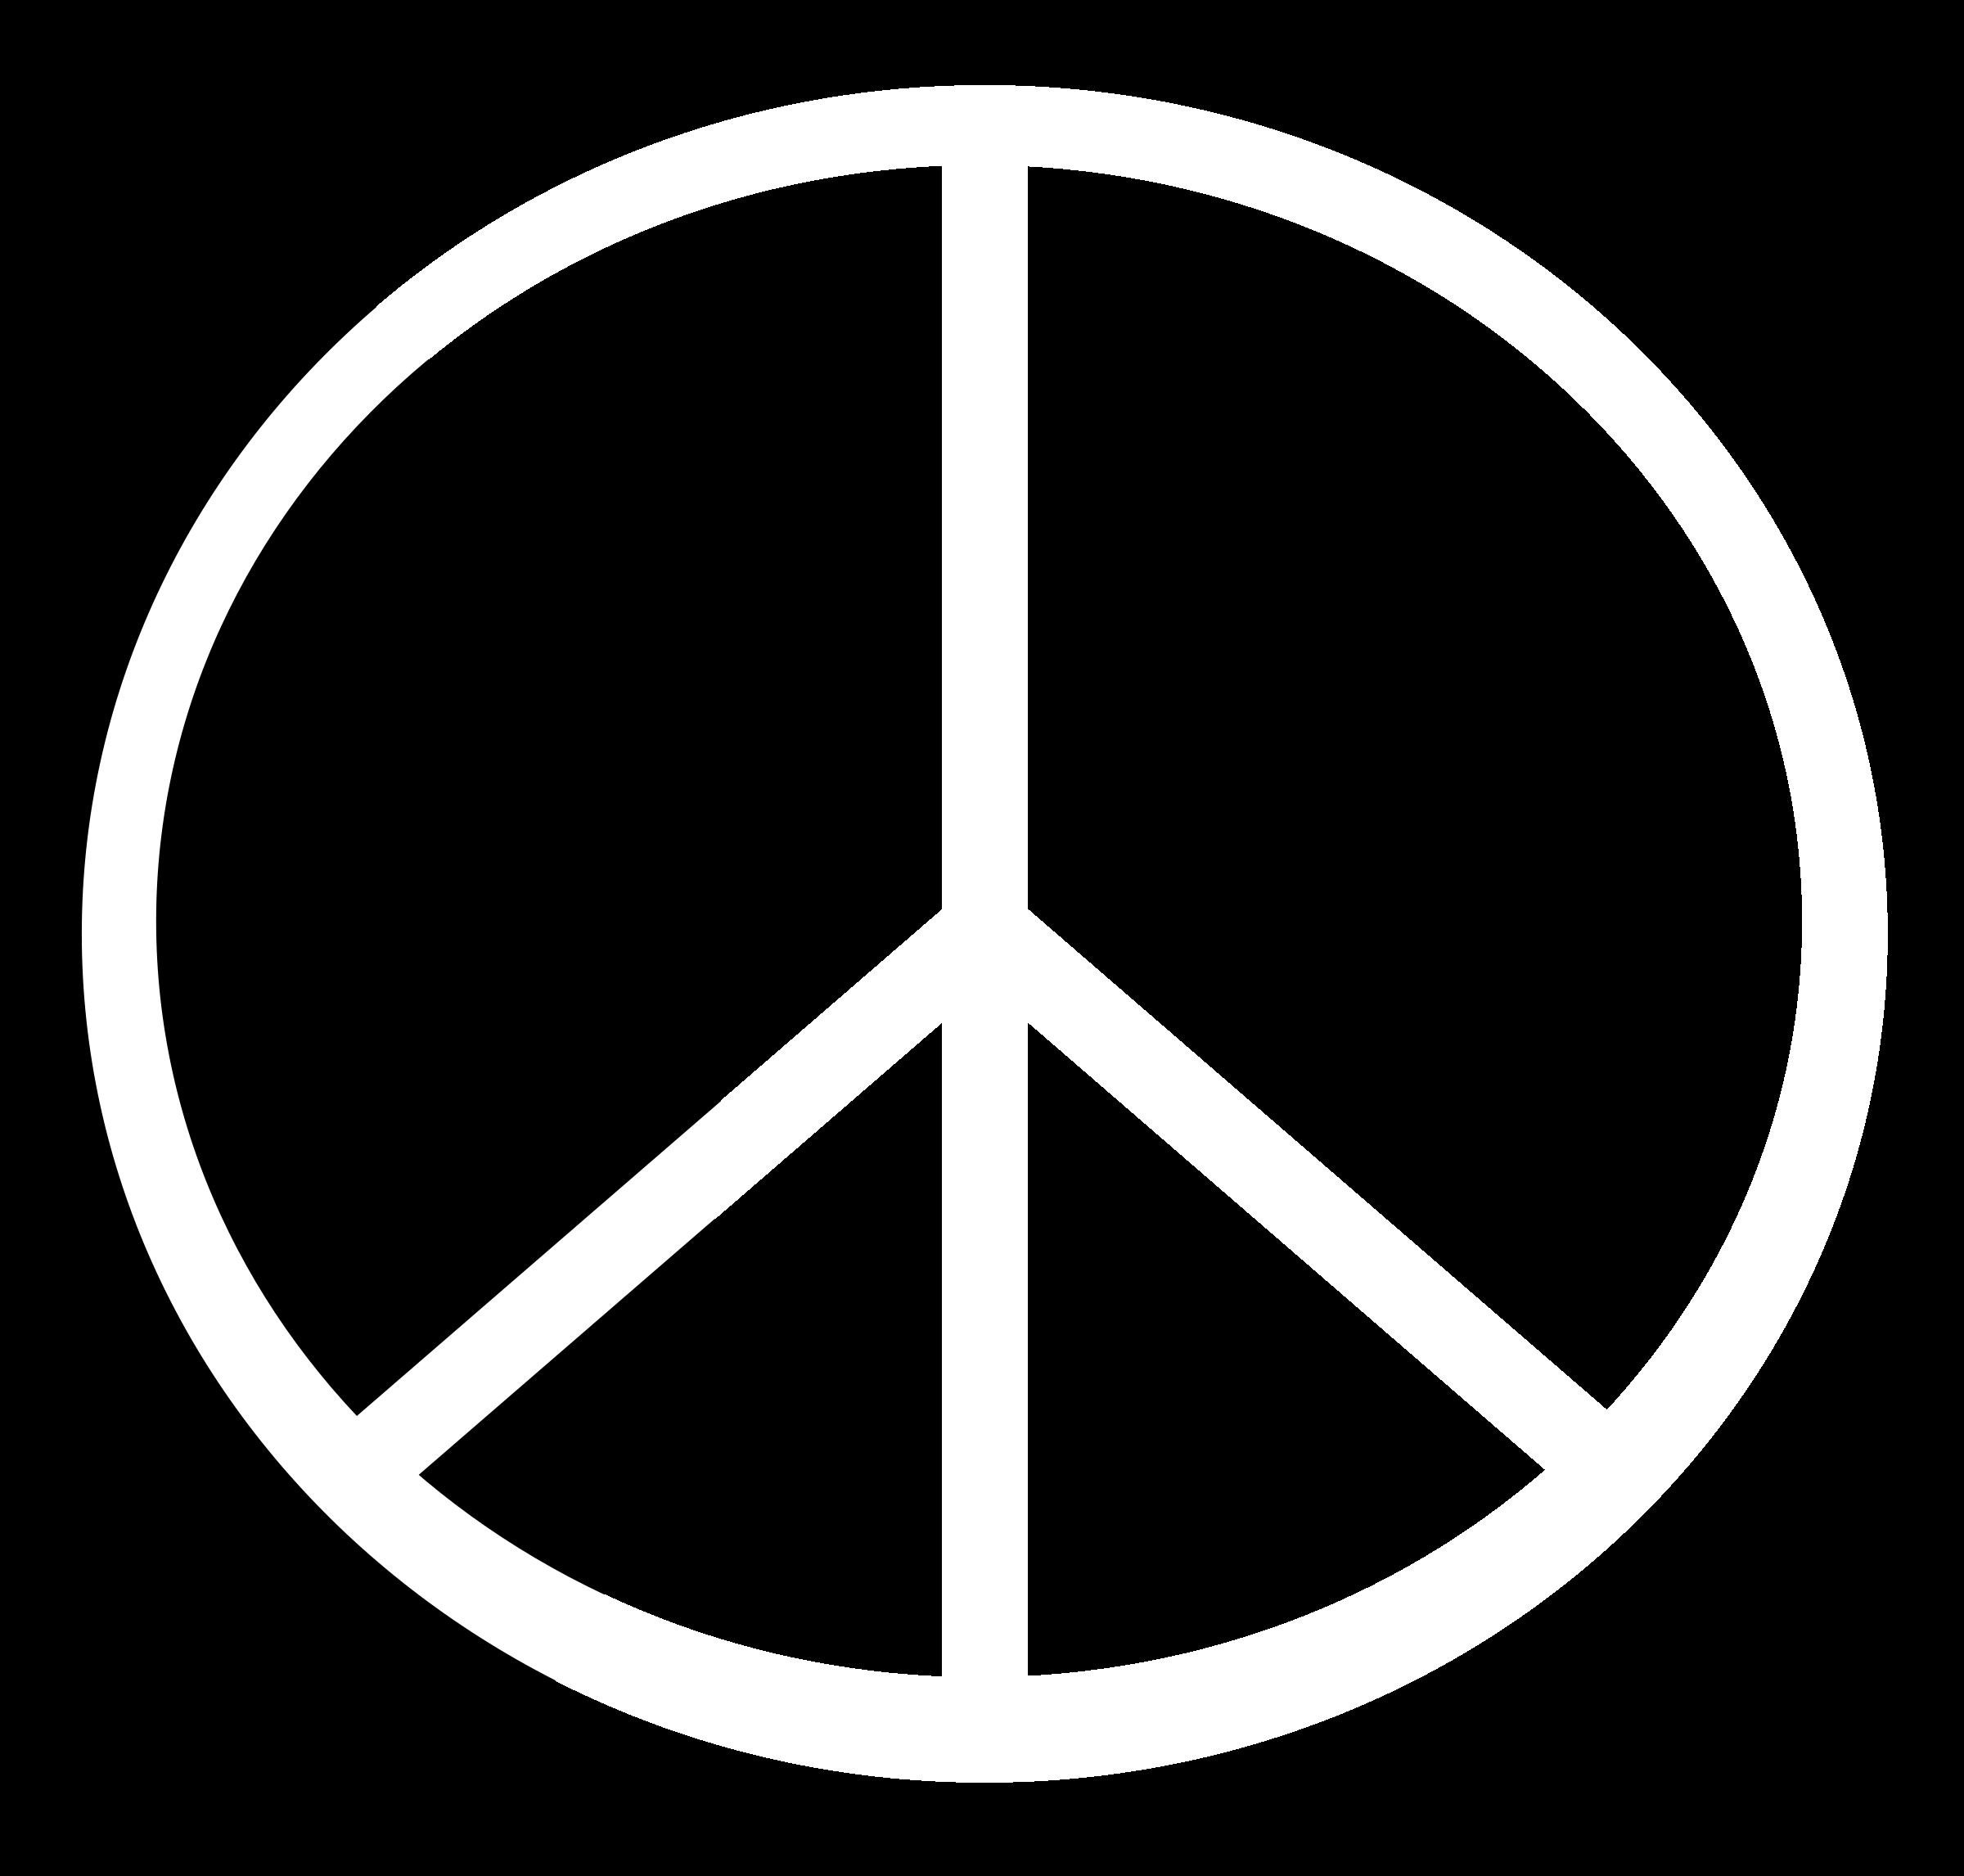 Symbol petri lum big. Peace clipart free font